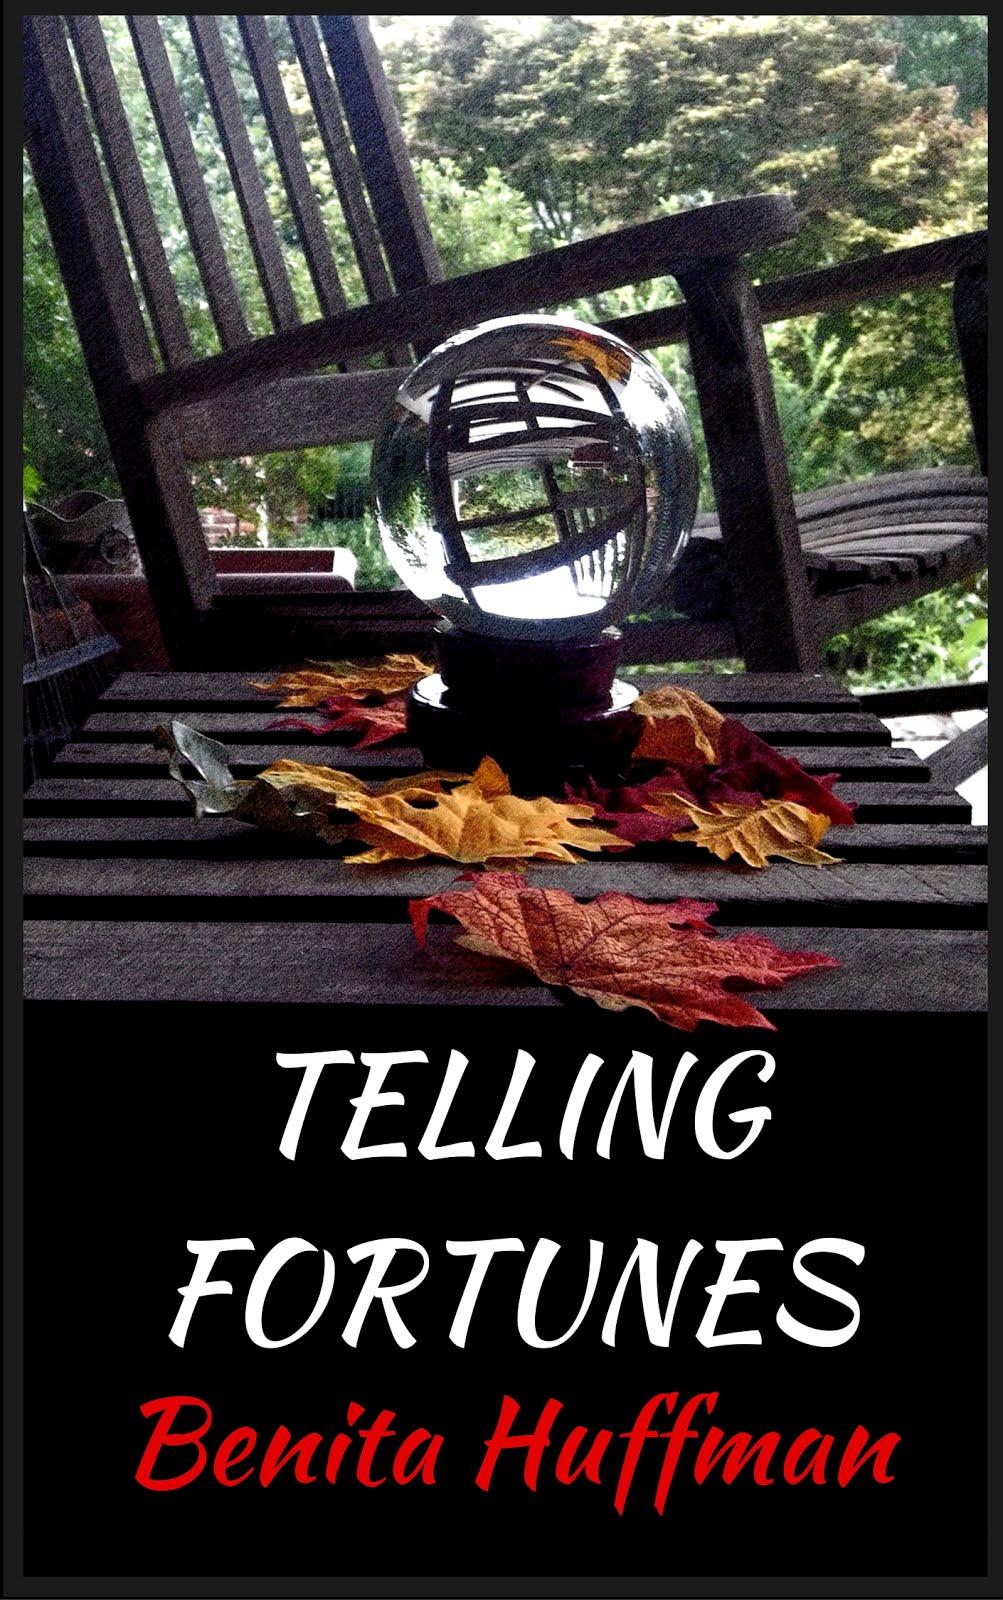 Telling Fortunes